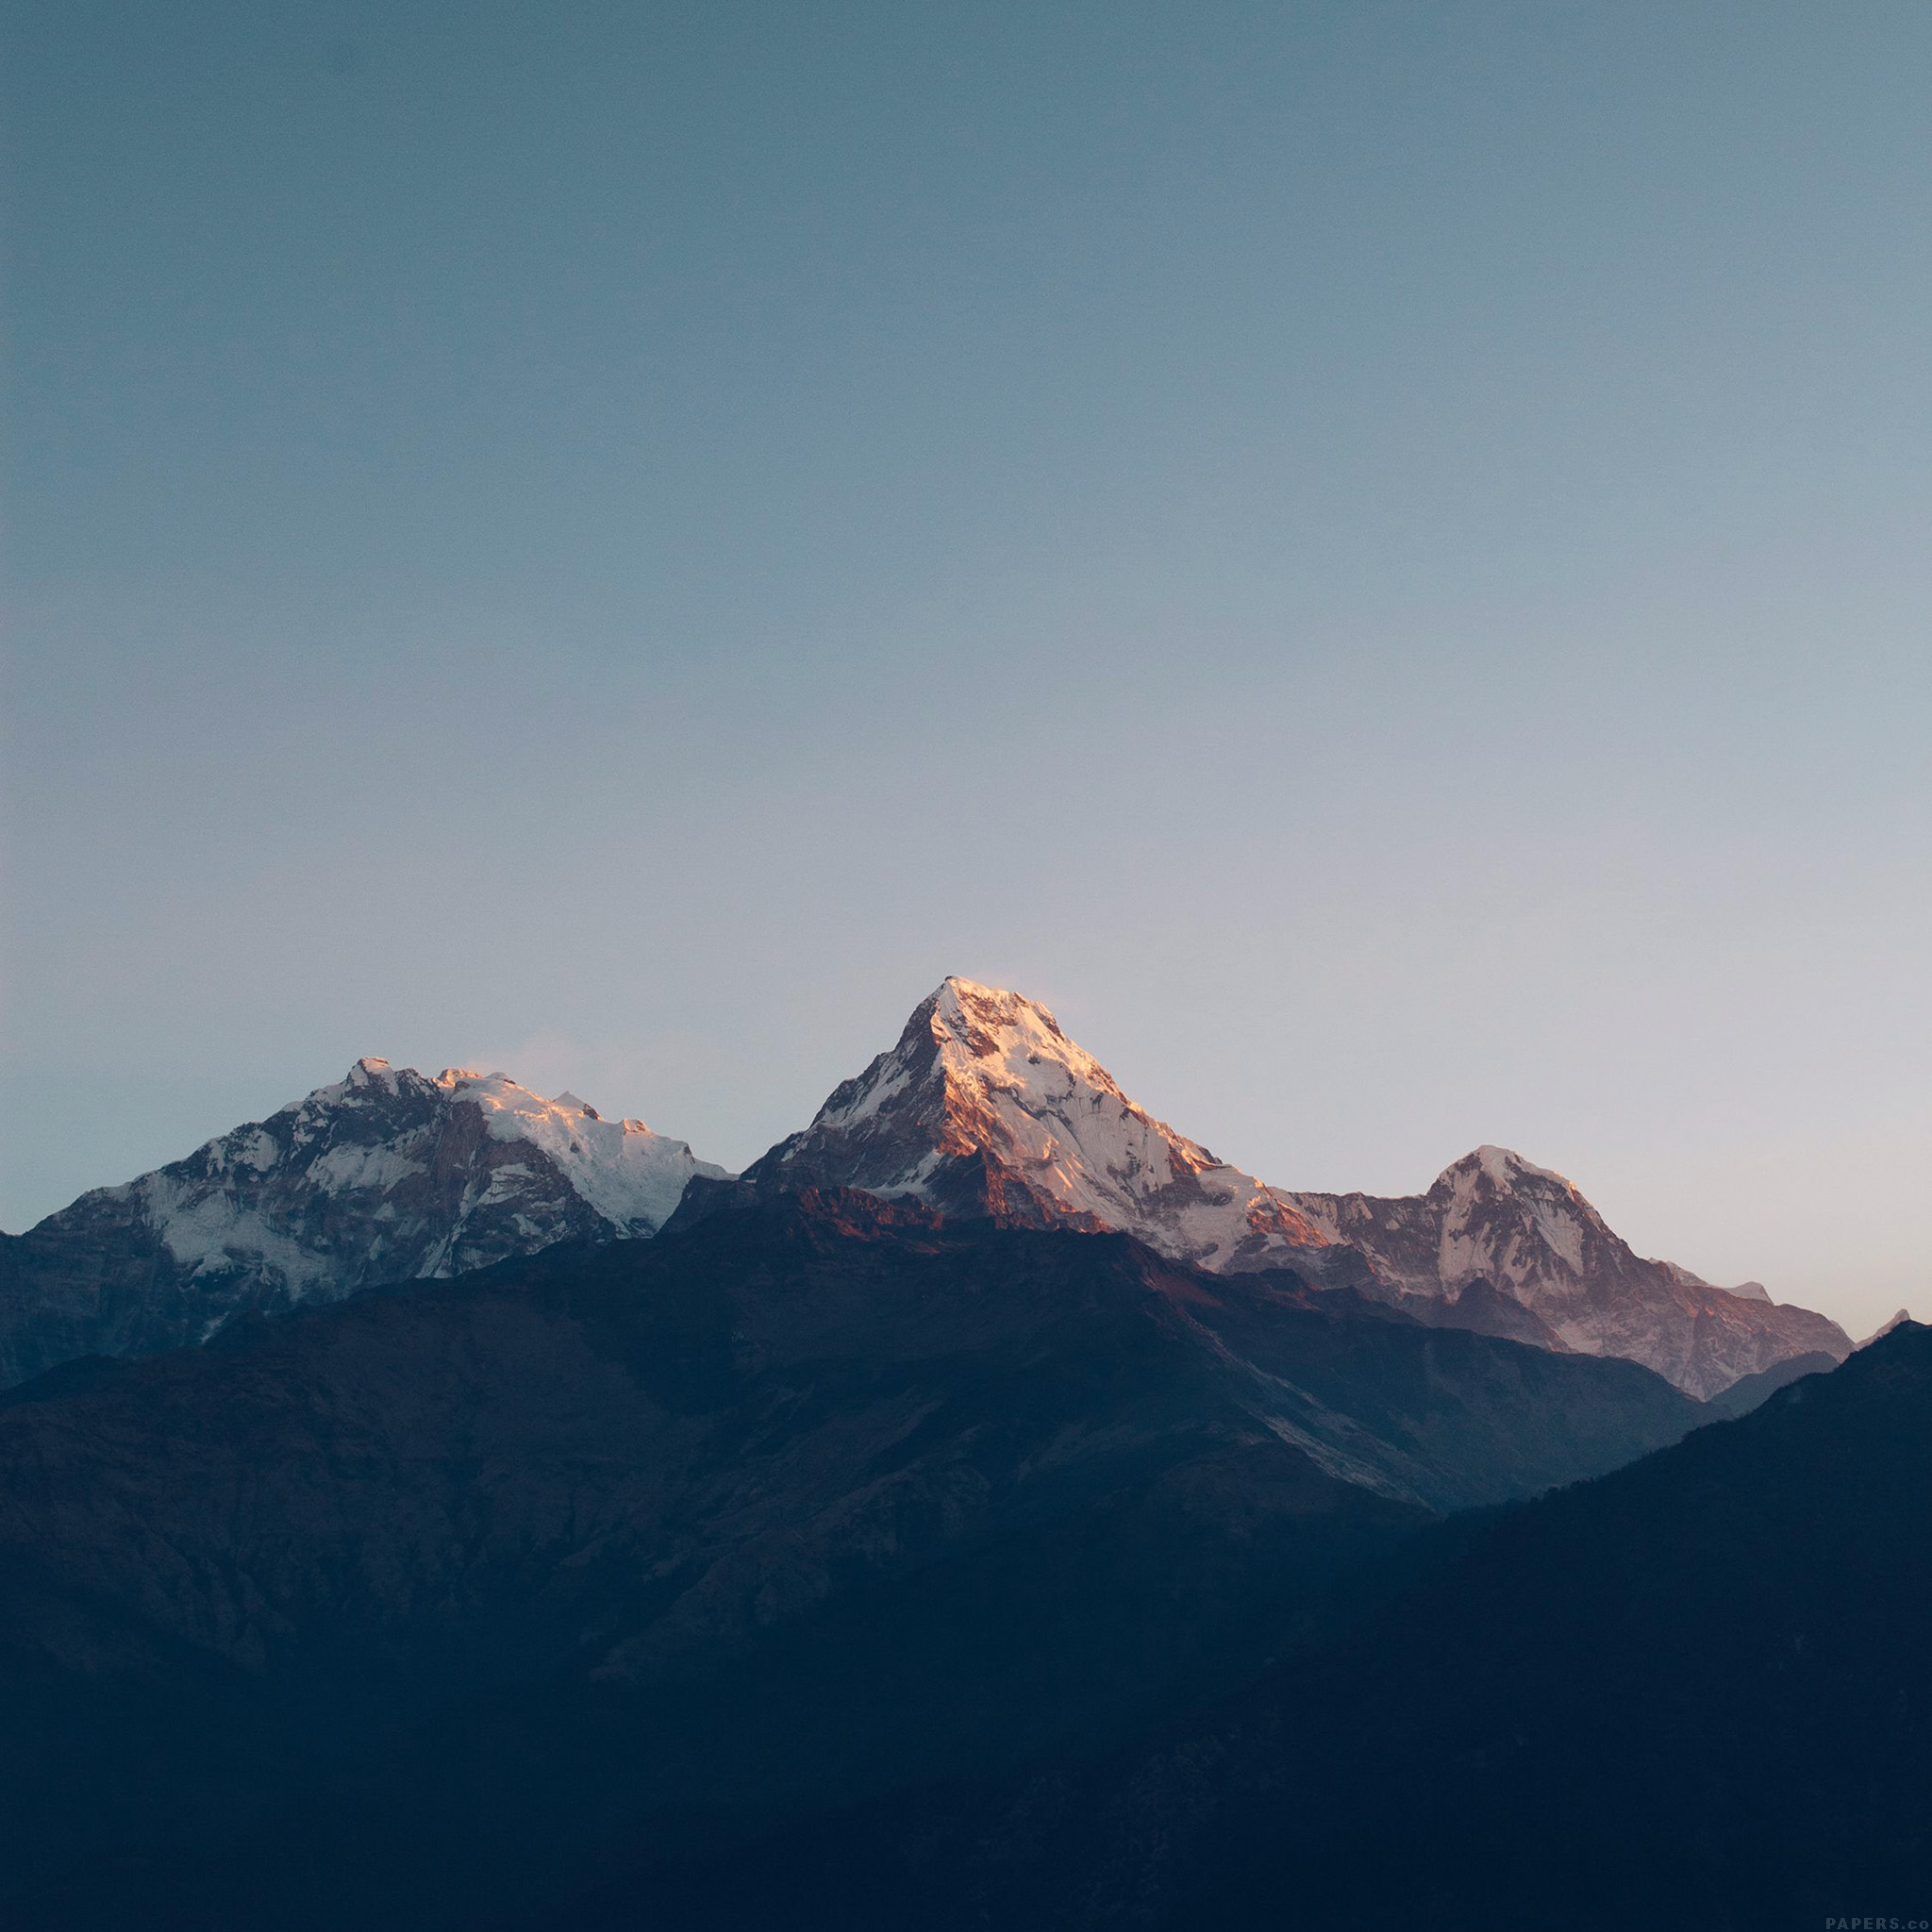 Ml65-mountain-blueish-high-sky-nature-rocky-wallpaper